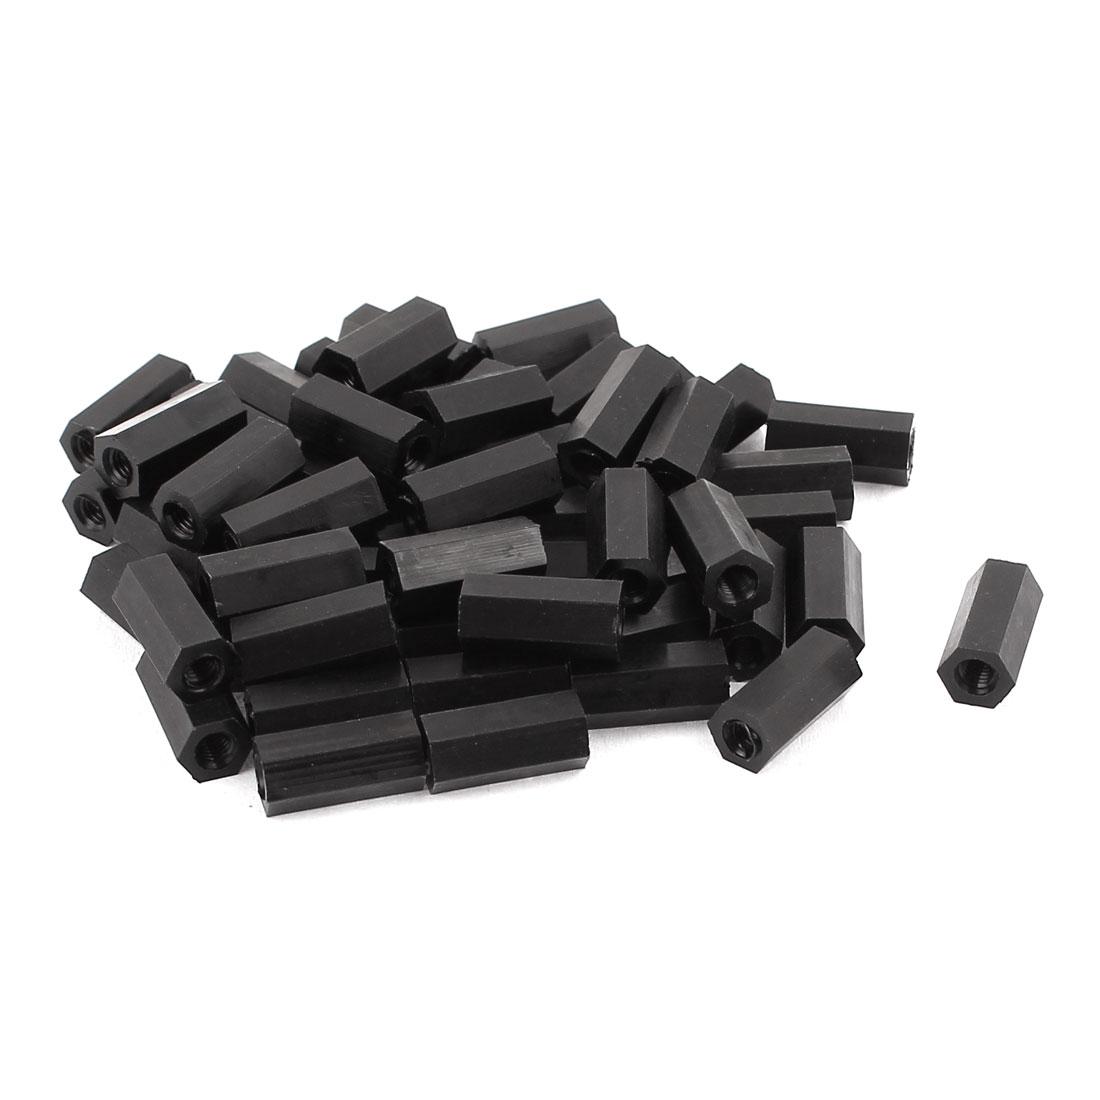 50Pcs M3x12mm Nylon Hex PCB Spacer Standoff Pillar Female Screw Nut Black